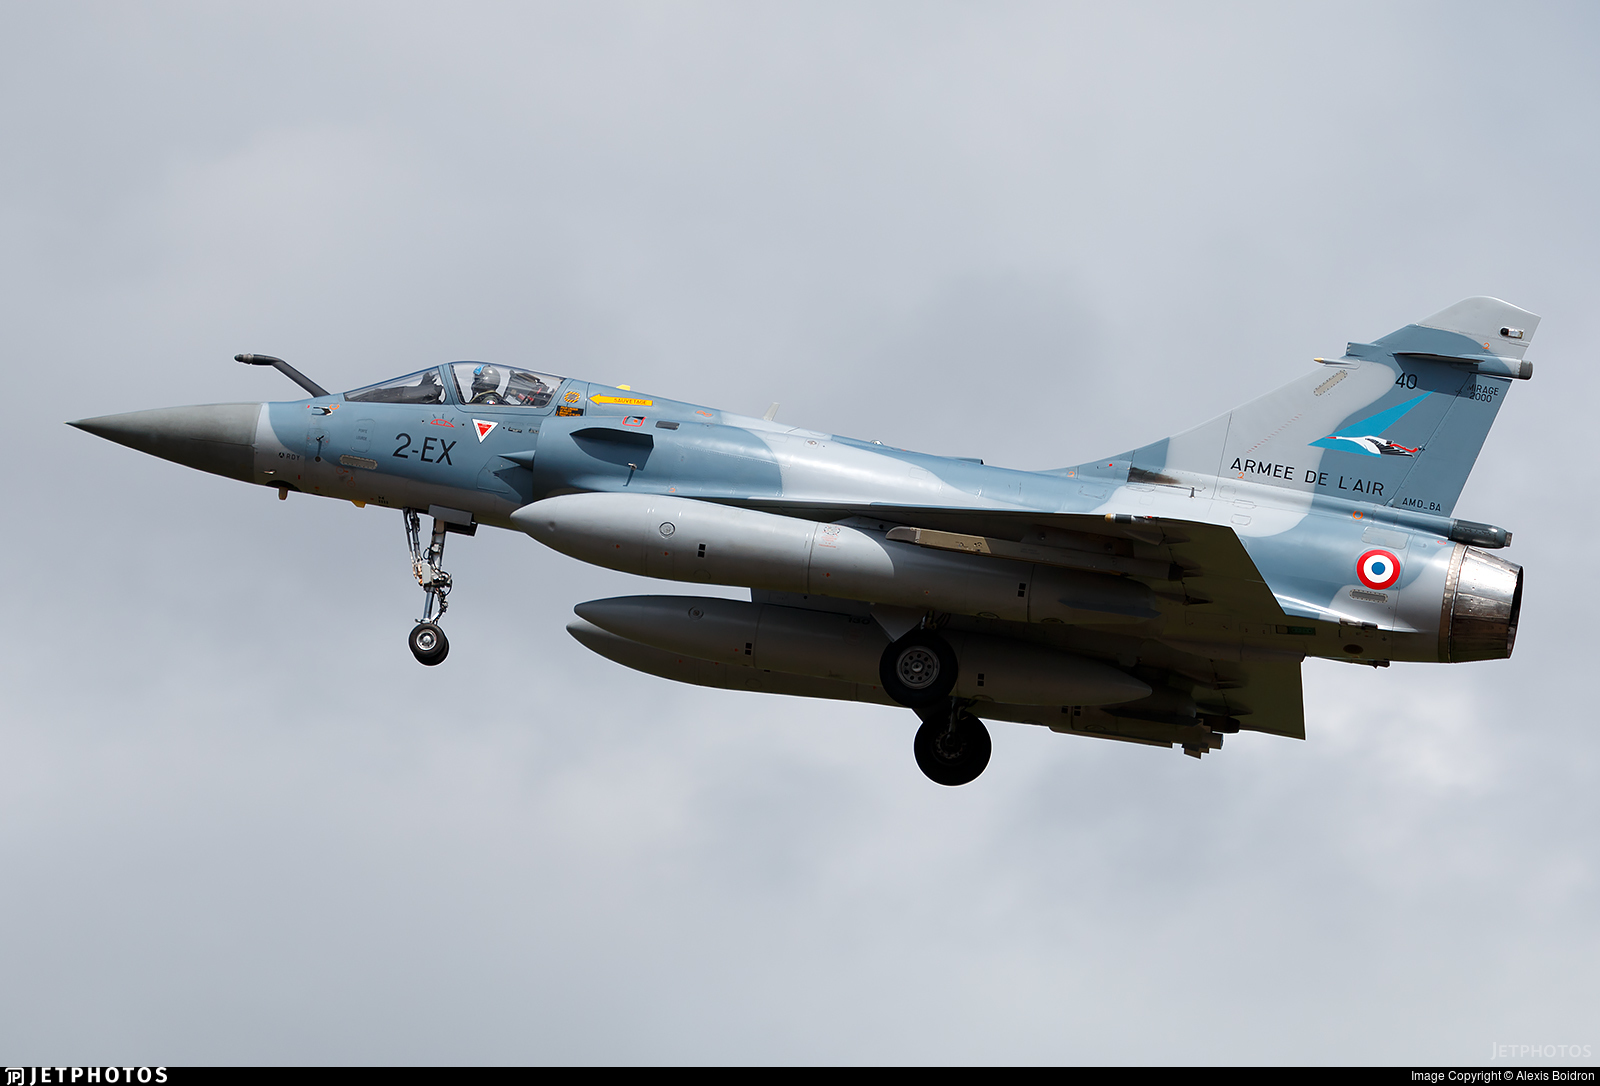 40 - Dassault Mirage 2000-5F - France - Air Force